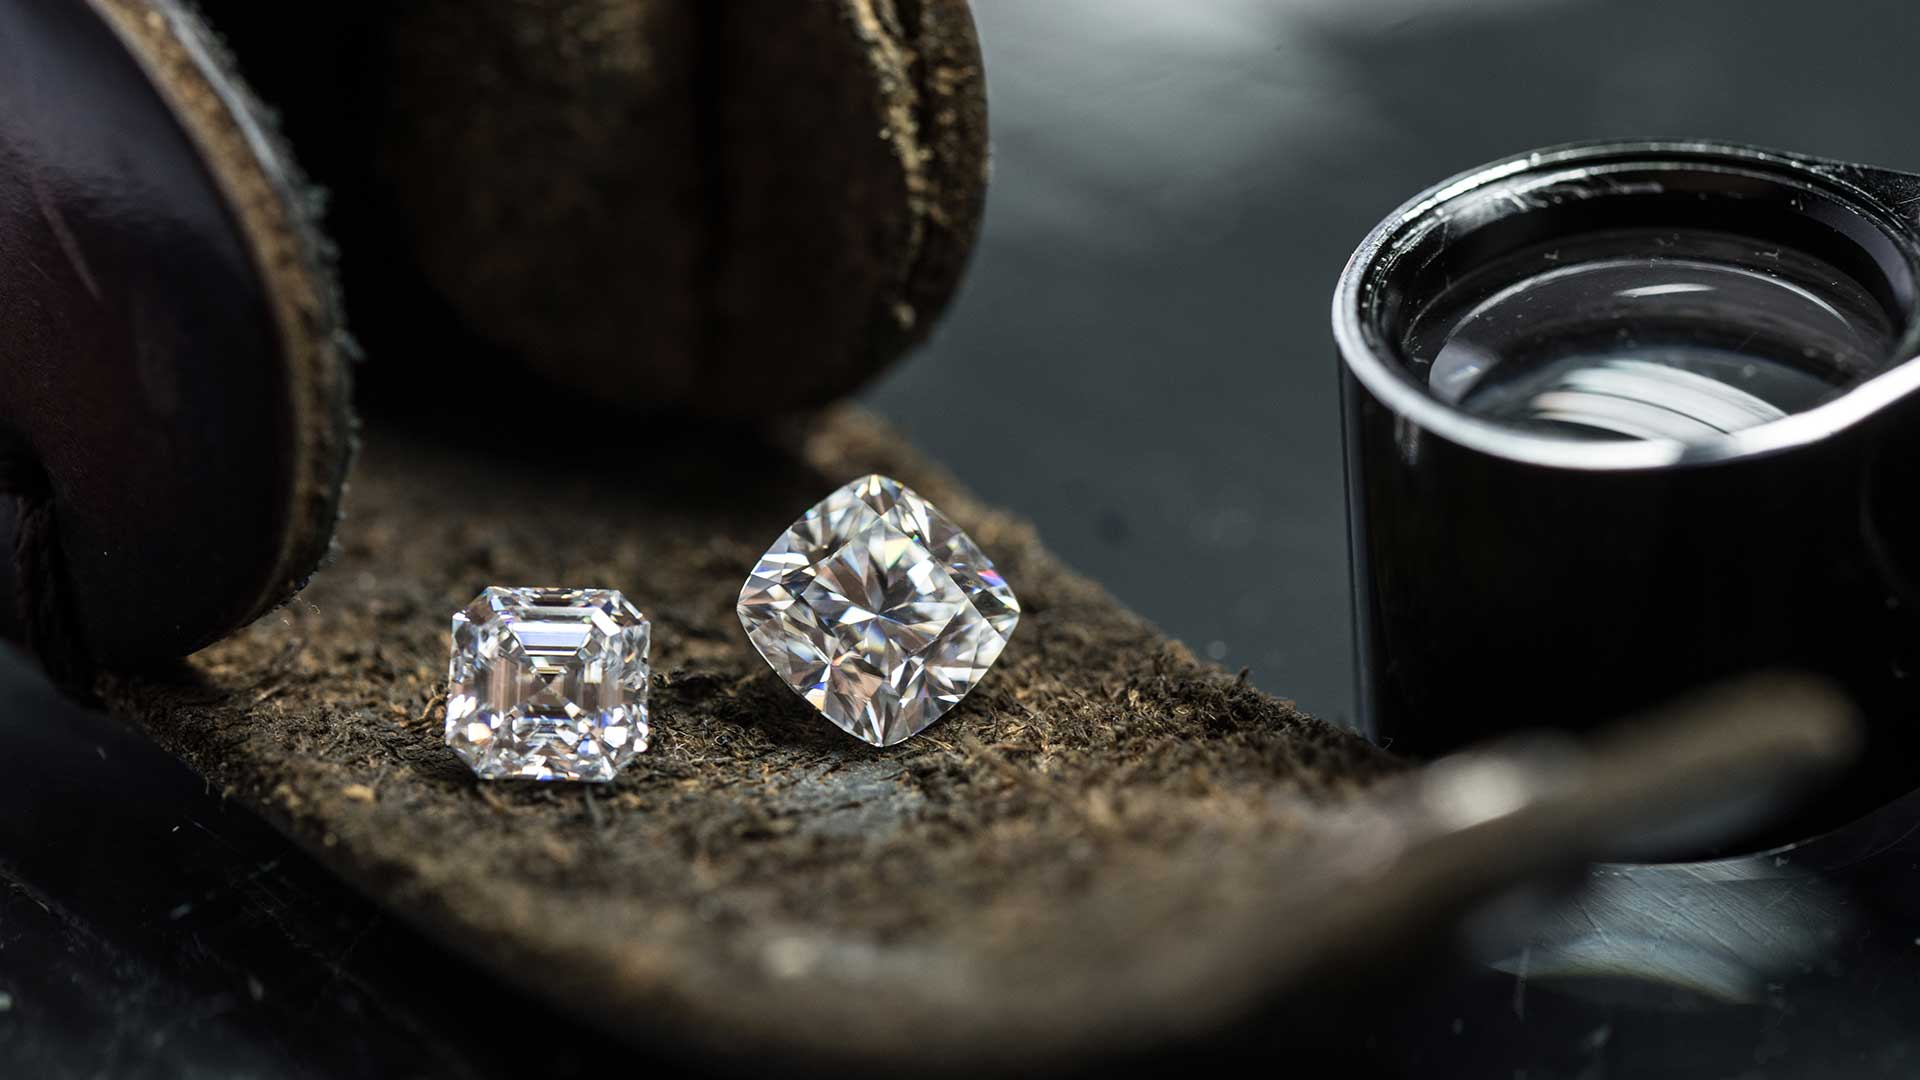 diamant-rare-prix-cher